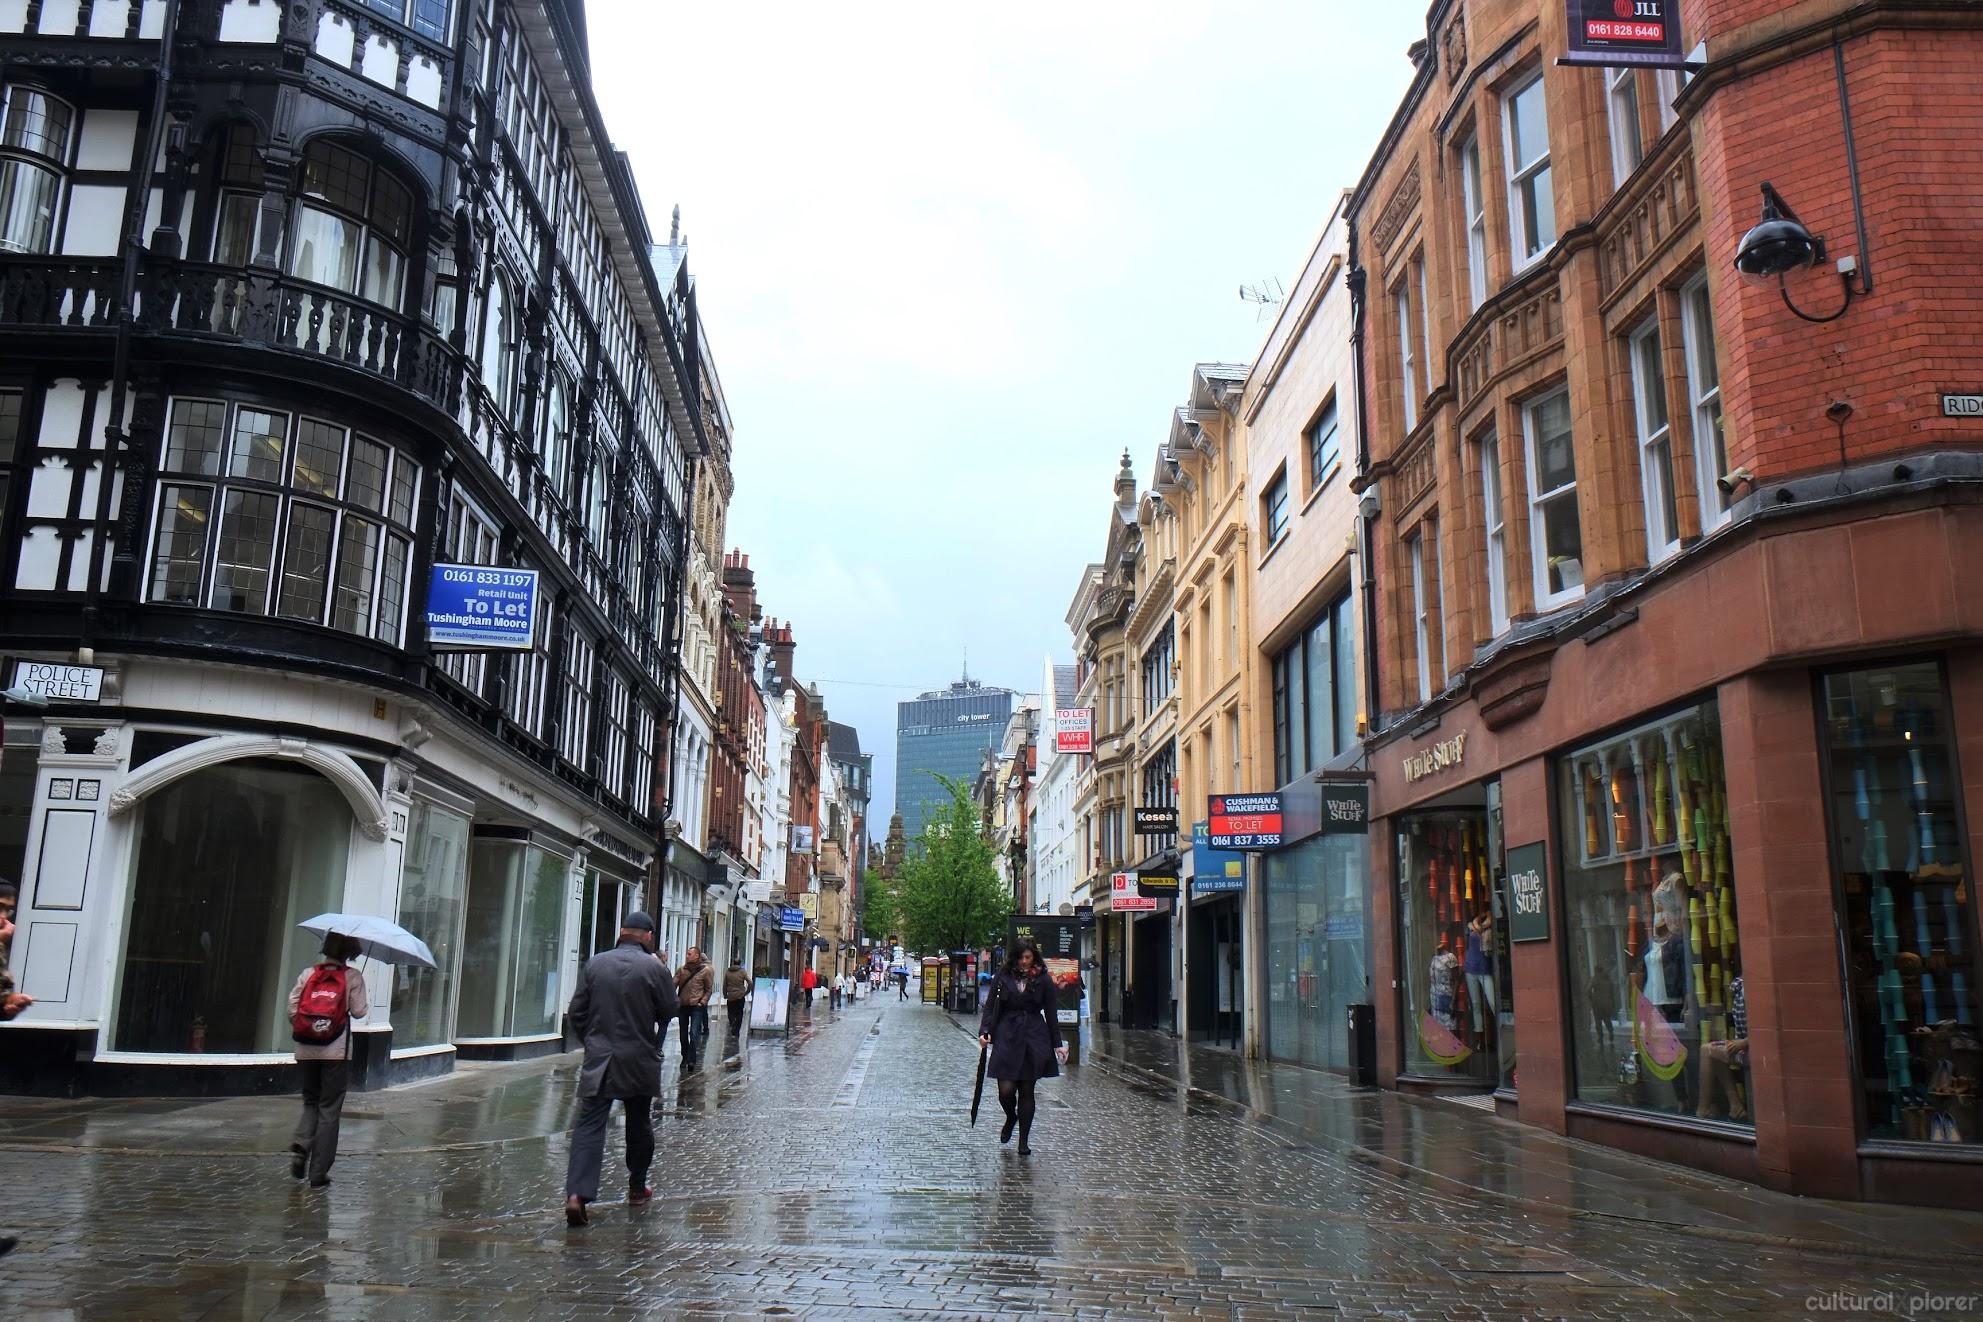 King Street Manchester